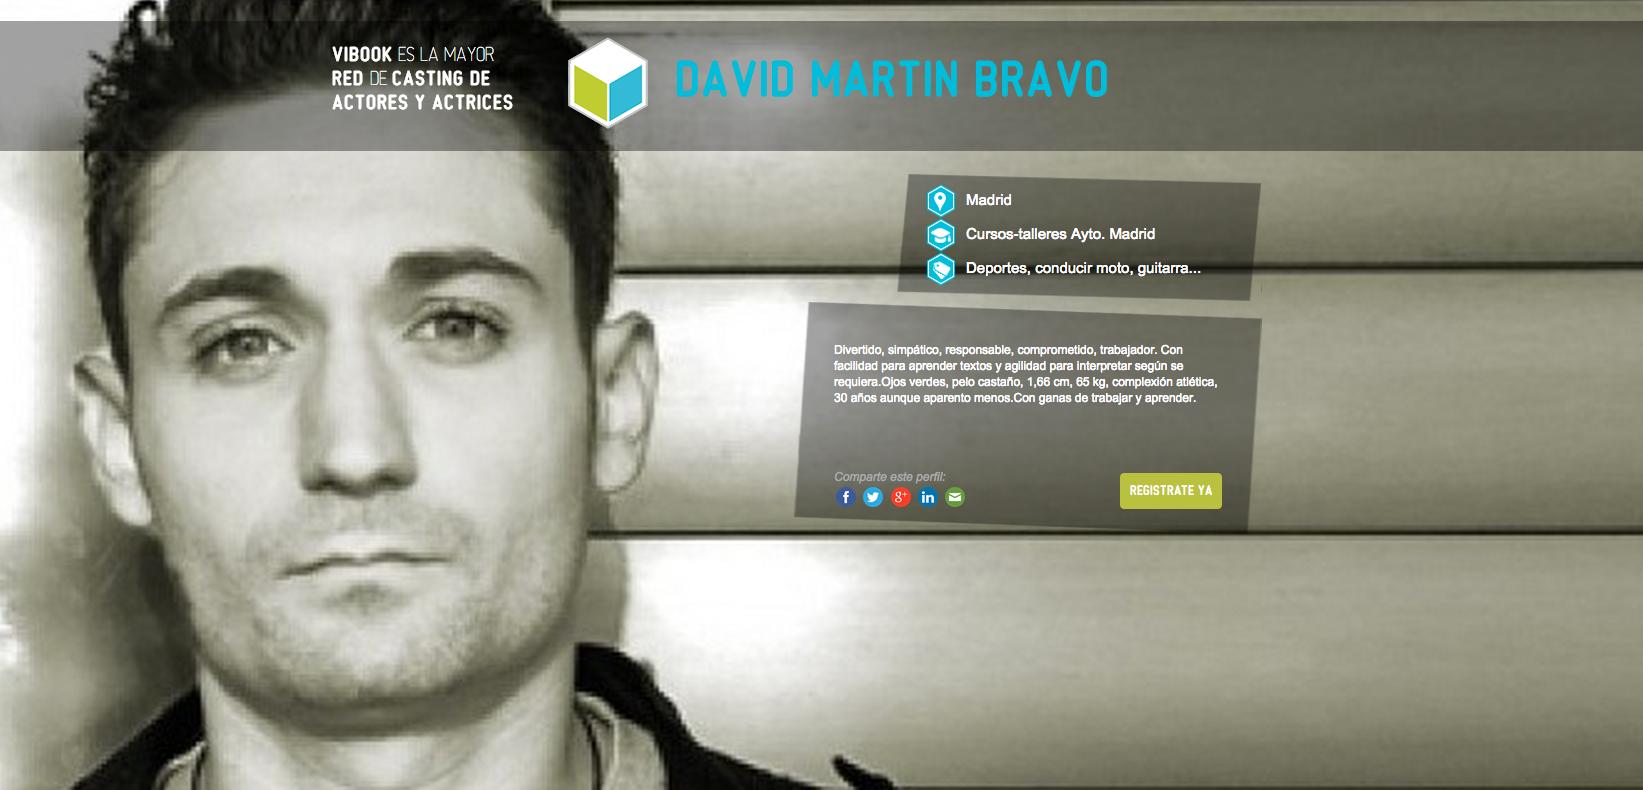 Actor DAVID MARTÍN BRAVO